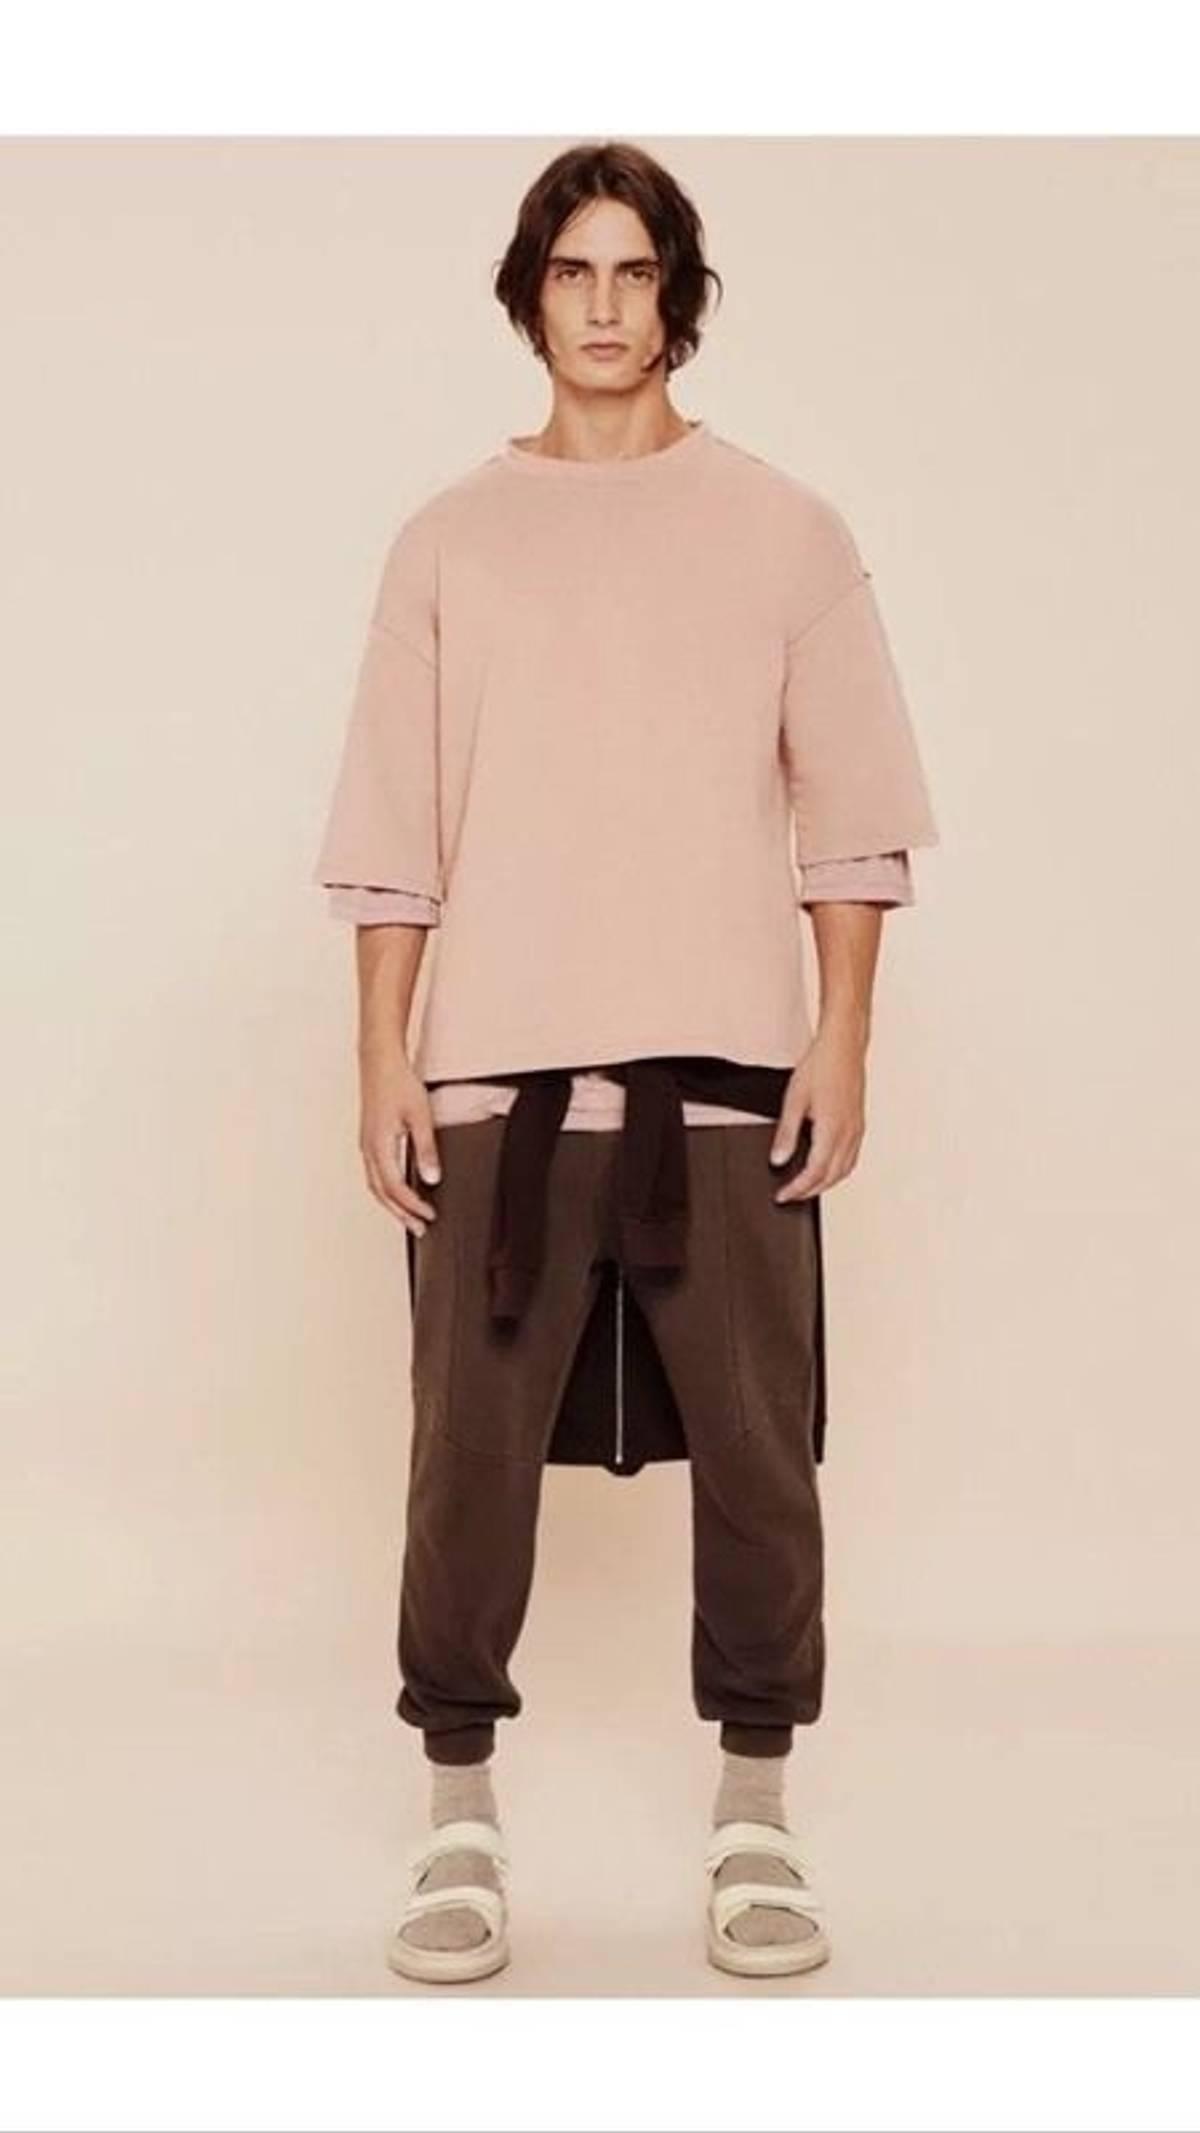 97590a147e0b5 Zara ×. Zara Short Sleeve Sweatshirt Yeezy Color Palette